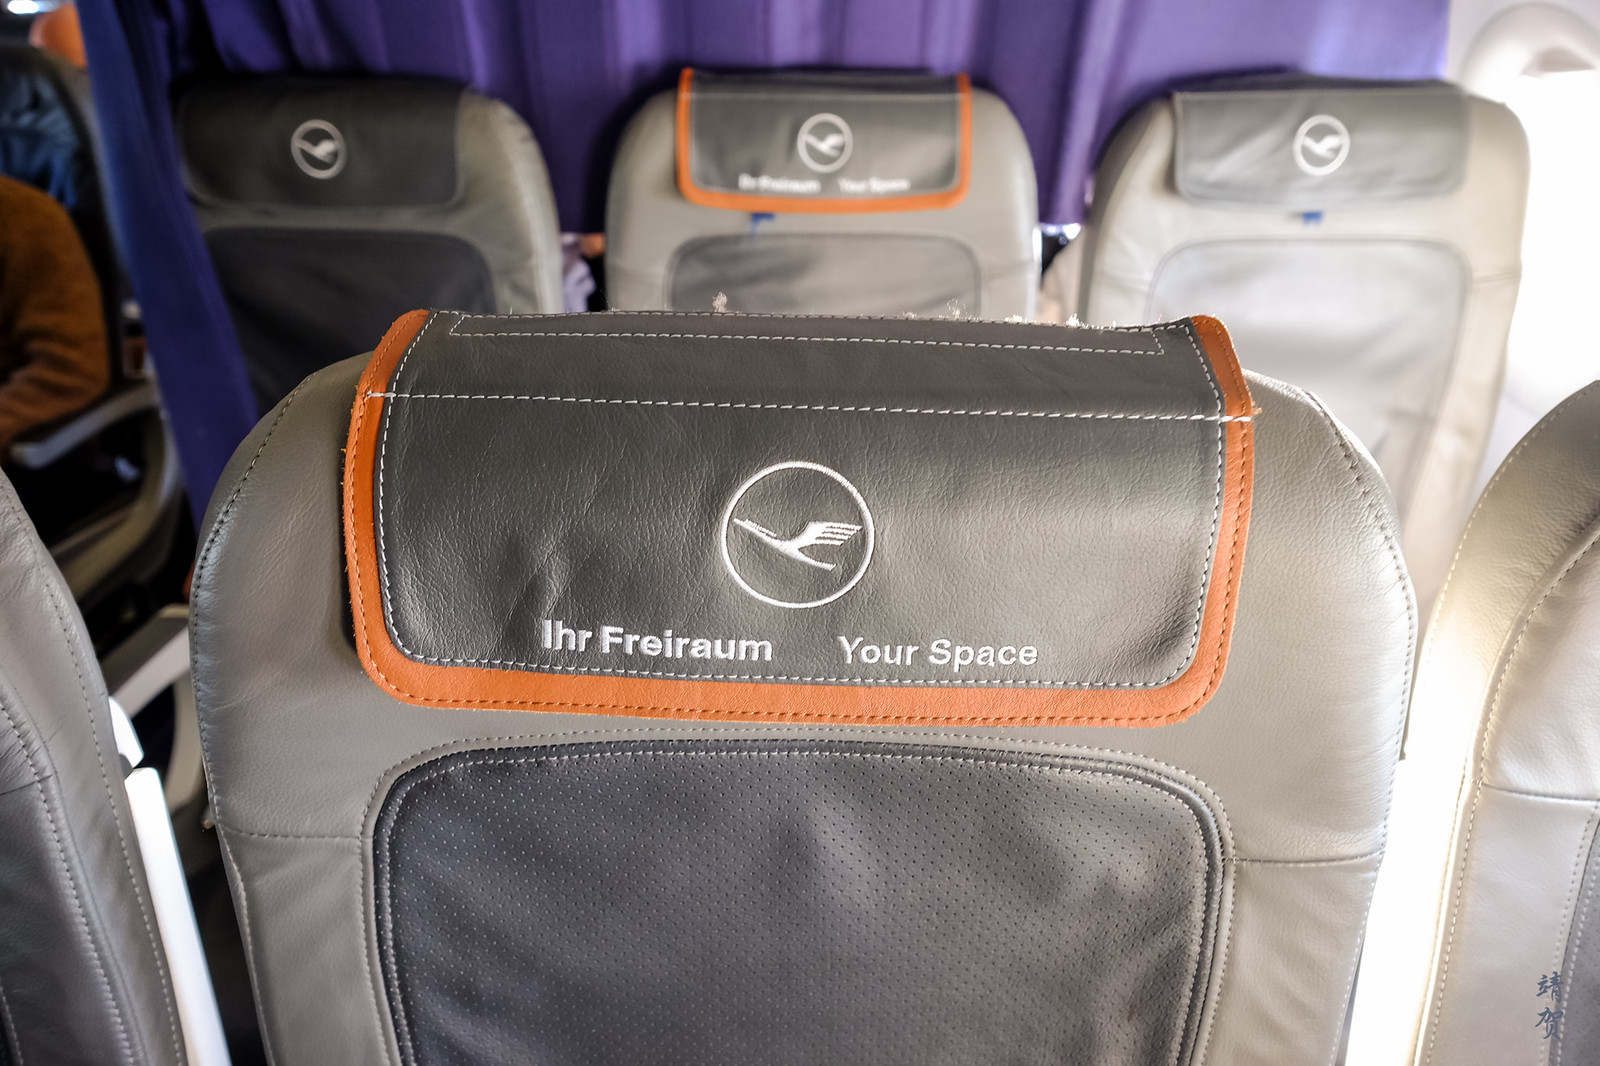 Seats onboard Lufthansa A320